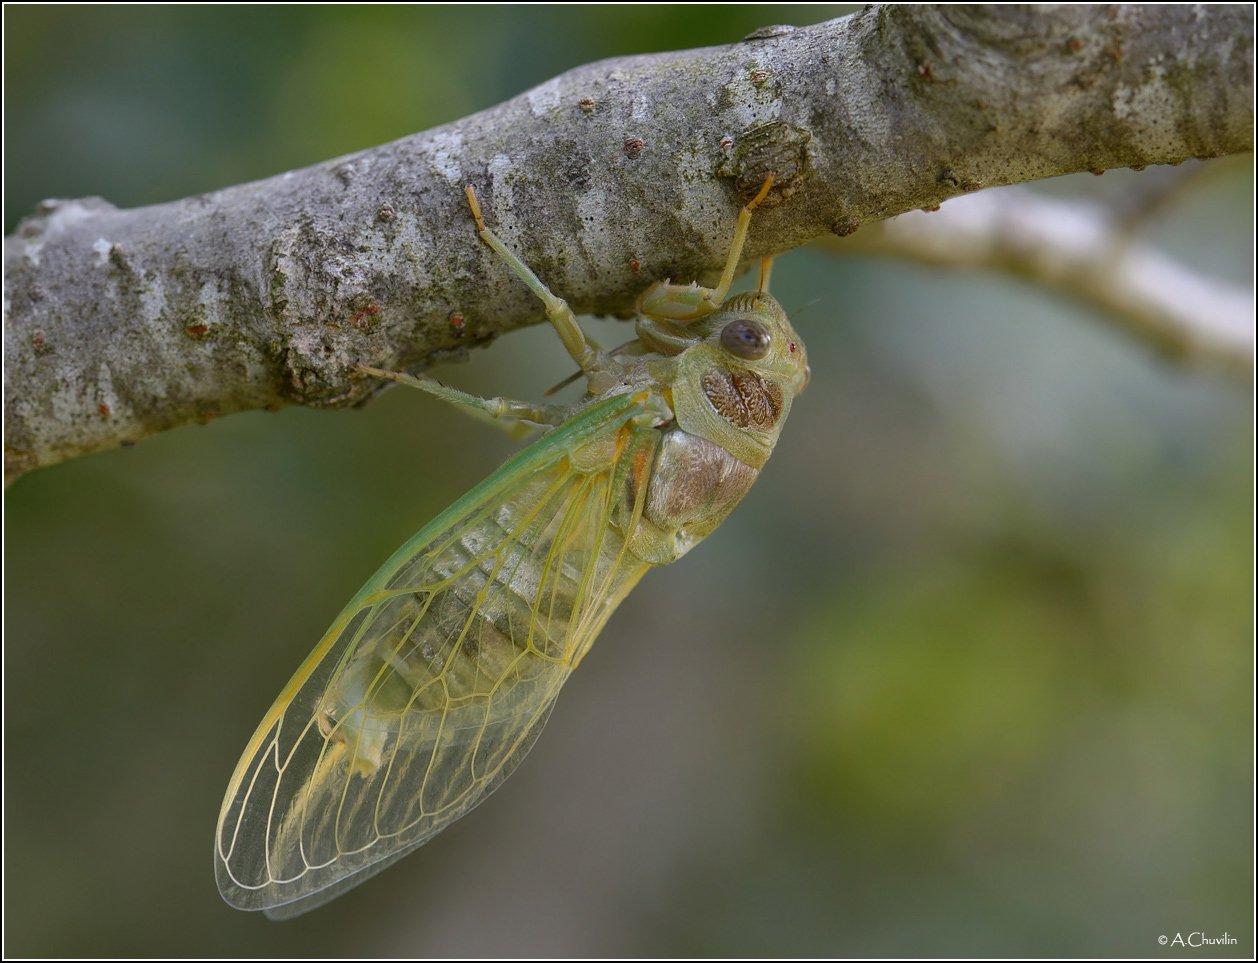 молодая цикадка сушит мягкие крылья, Александр Чувилин